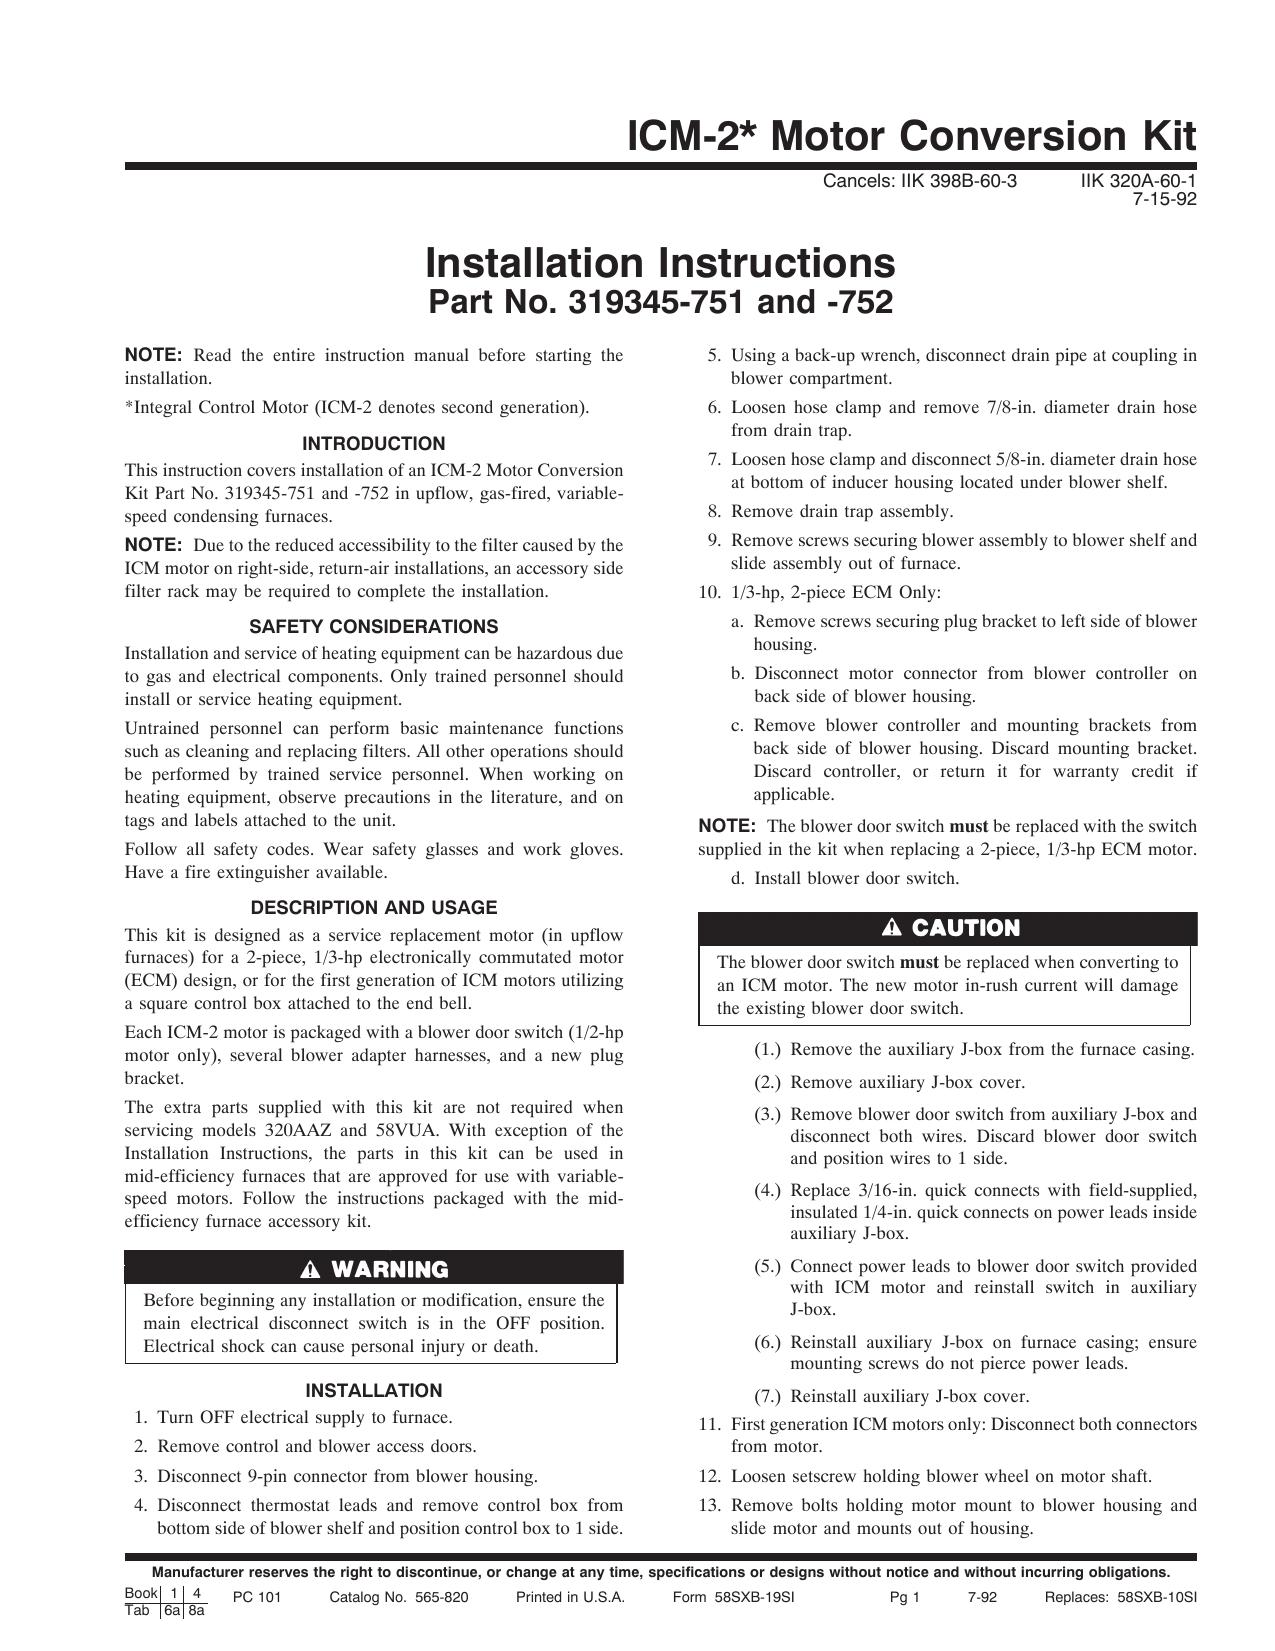 Icm 2 Motor Conversion Kit Installation Instructions Manualzz